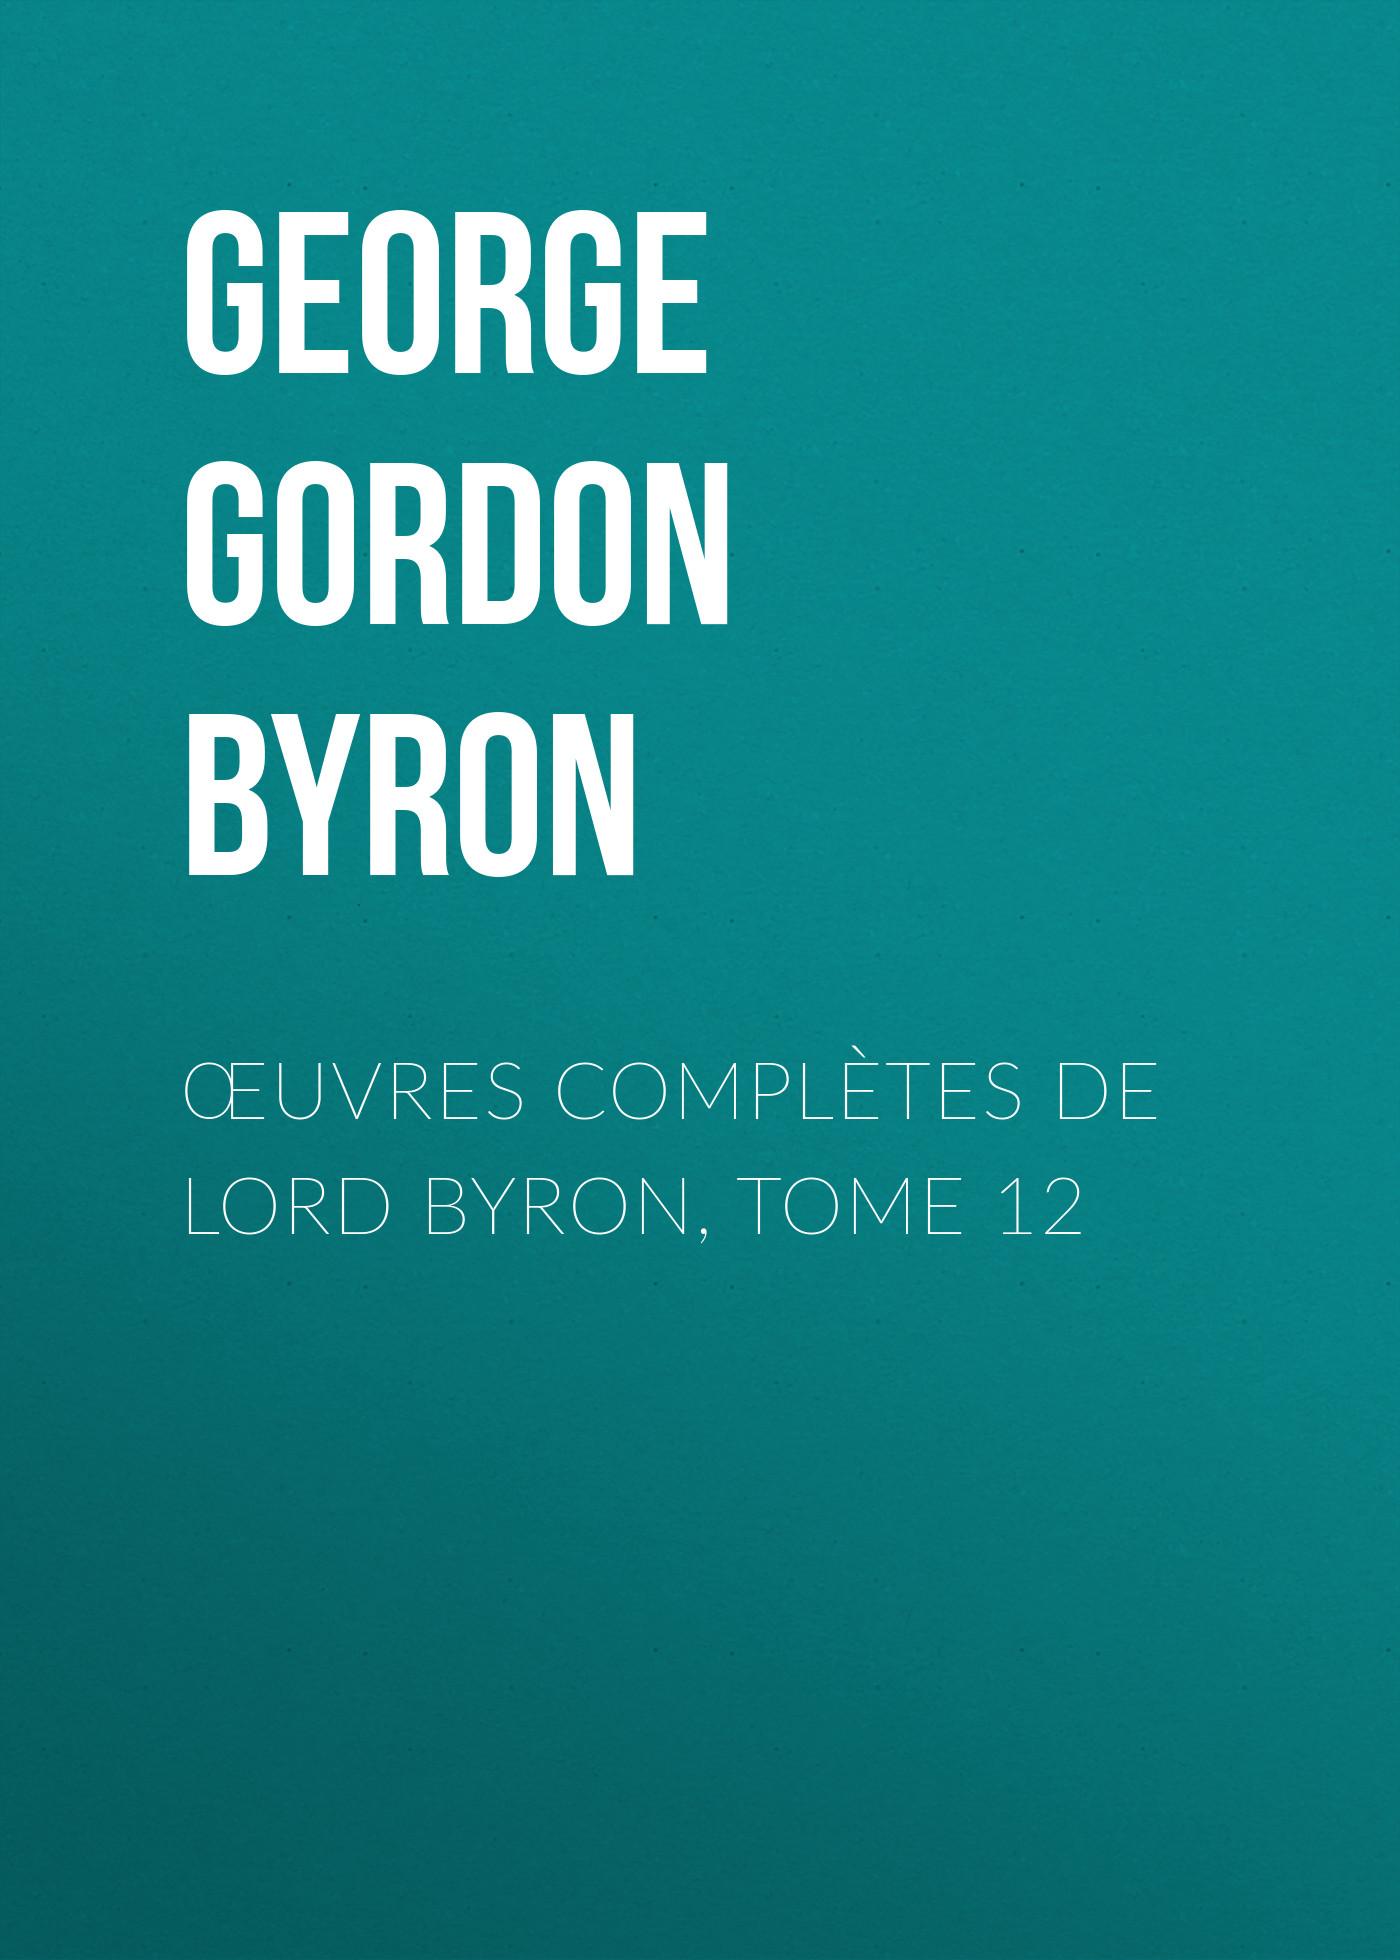 Джордж Гордон Байрон Œuvres complètes de lord Byron, Tome 12 thomas medwin conversations of lord byron